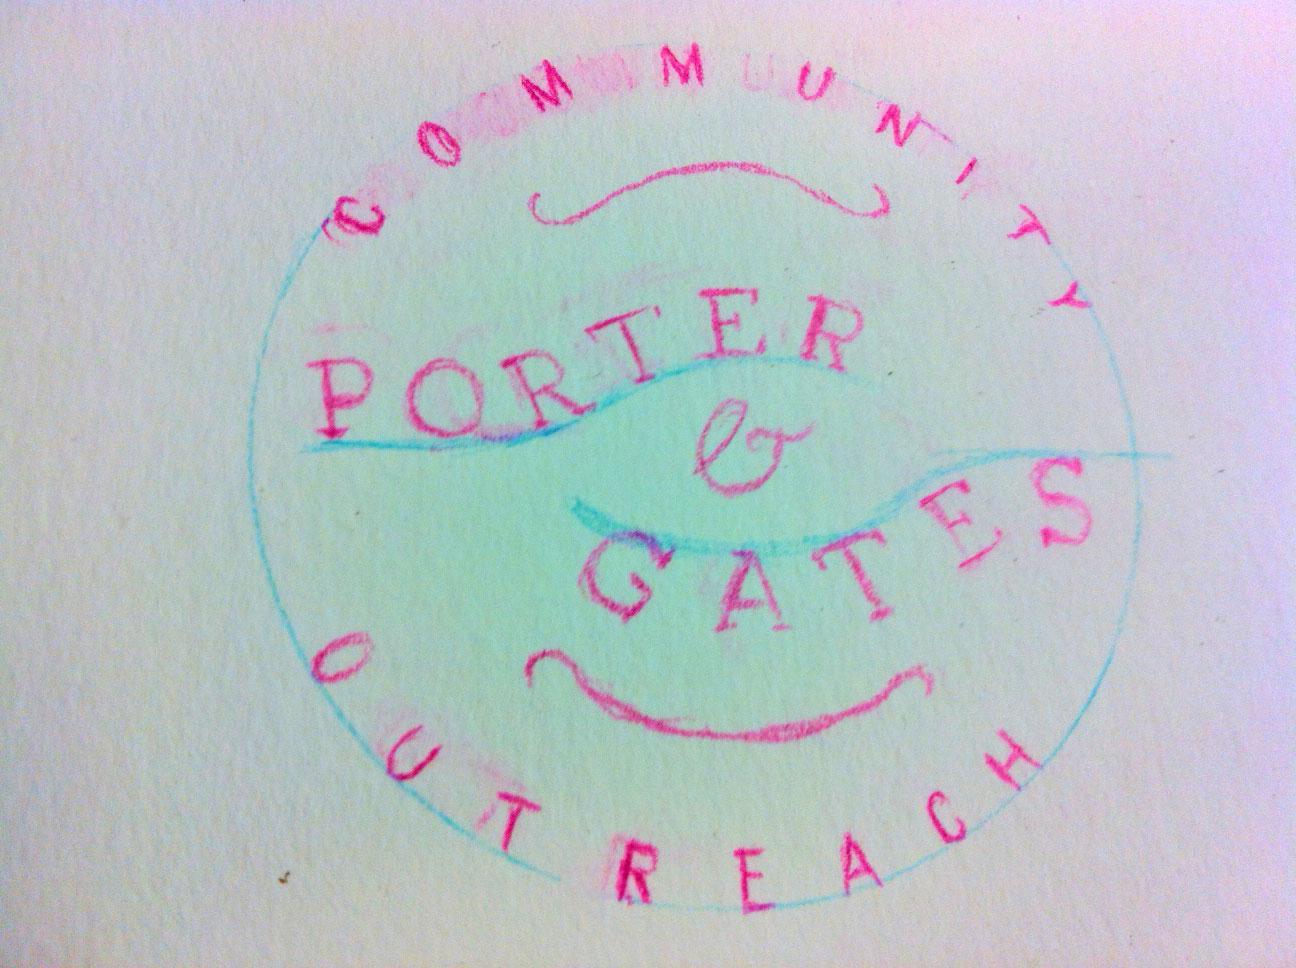 Porter+Gates Logo Sketches - image 1 - student project